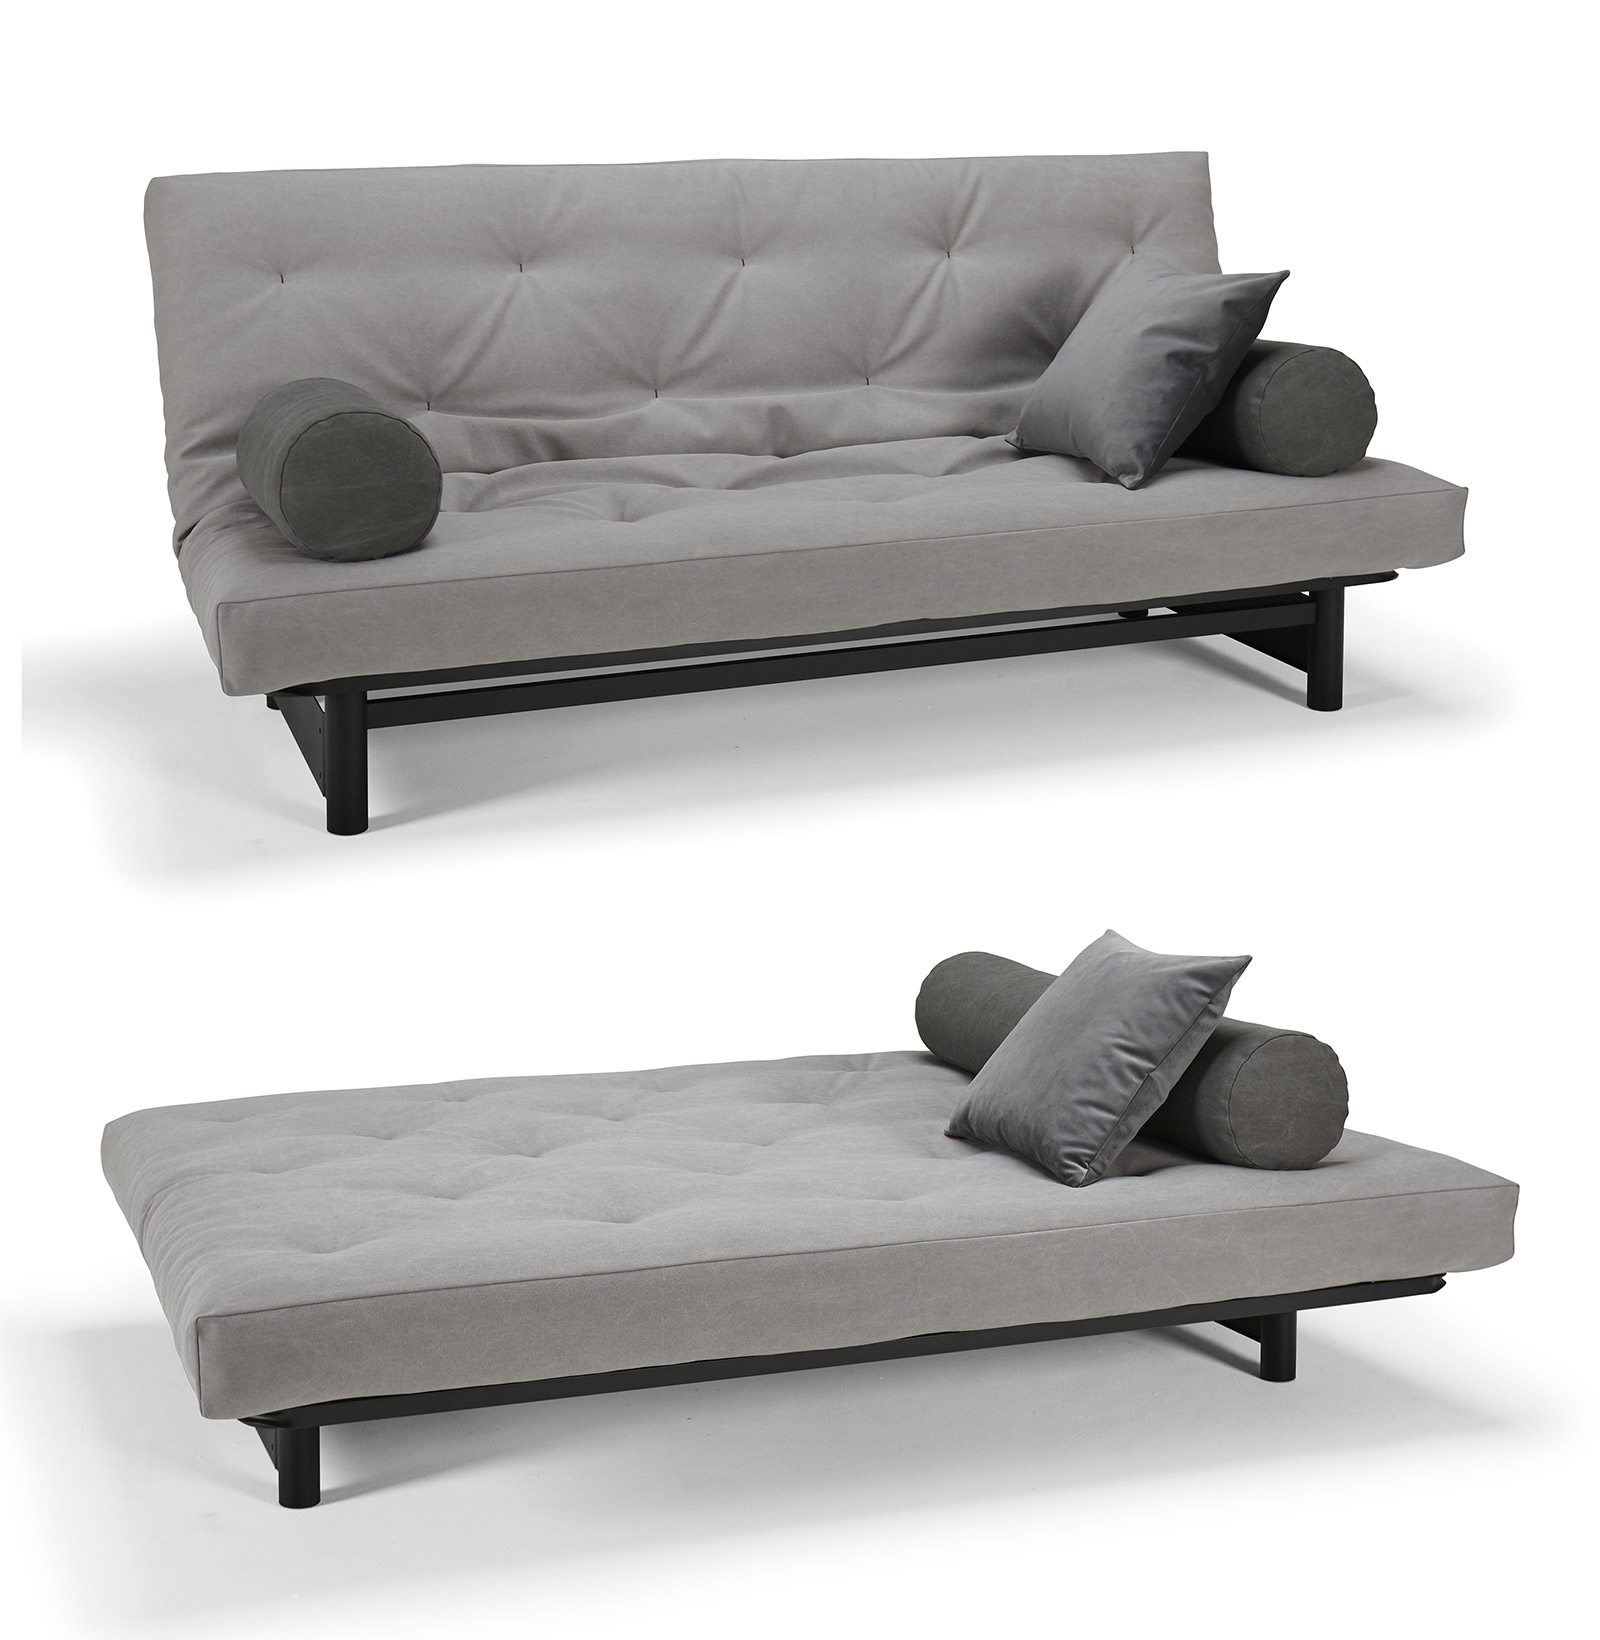 Futon design canap s lits facile fuji canap lit - Canape lit facile a ouvrir ...